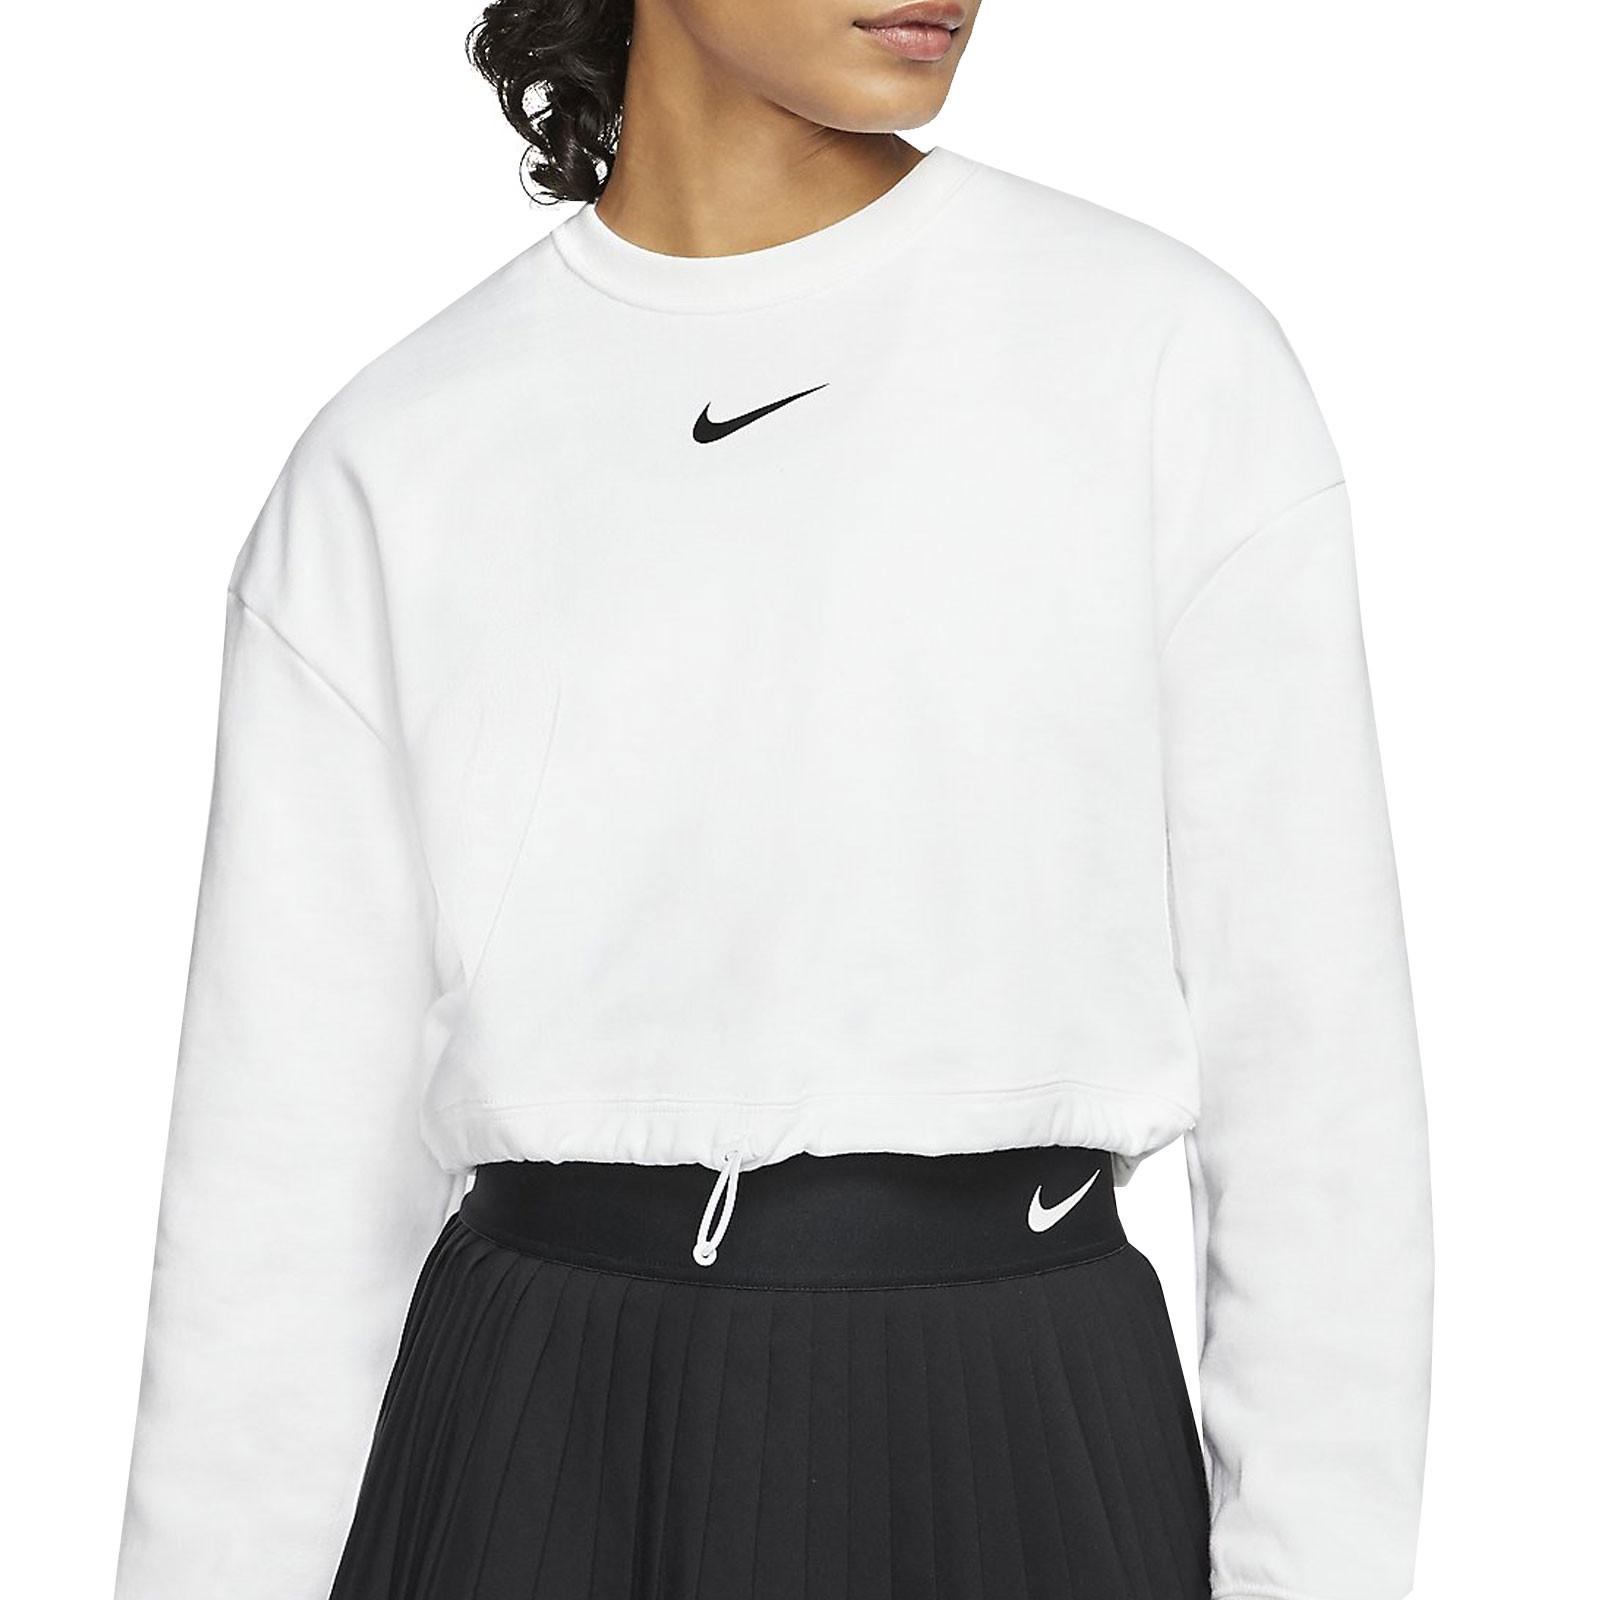 Mutuo detrás Anémona de mar  Sudadera Nike mujer Swoosh Crew blanca | futbolmania